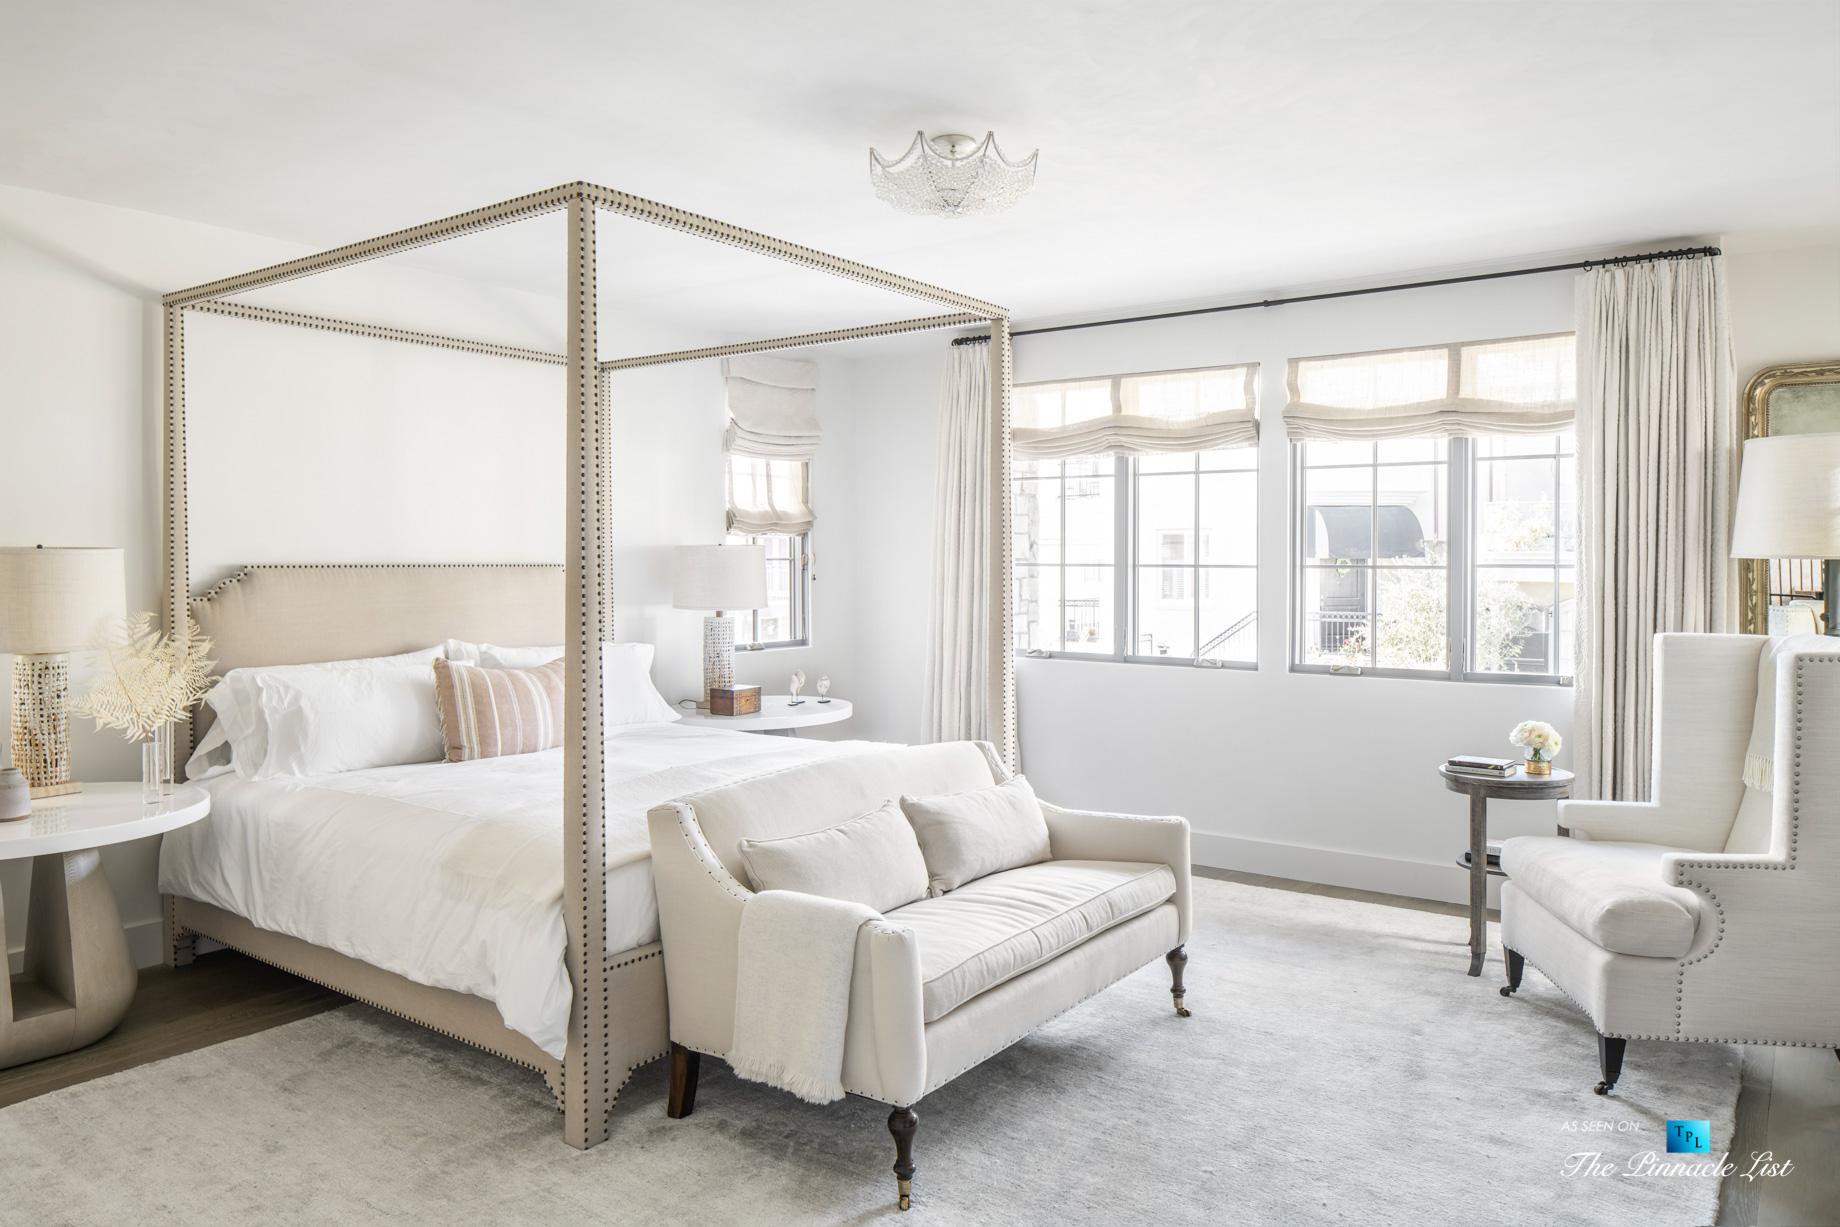 220 8th St, Manhattan Beach, CA, USA – Luxury Real Estate – Ocean View Dream Home – Master Bedroom